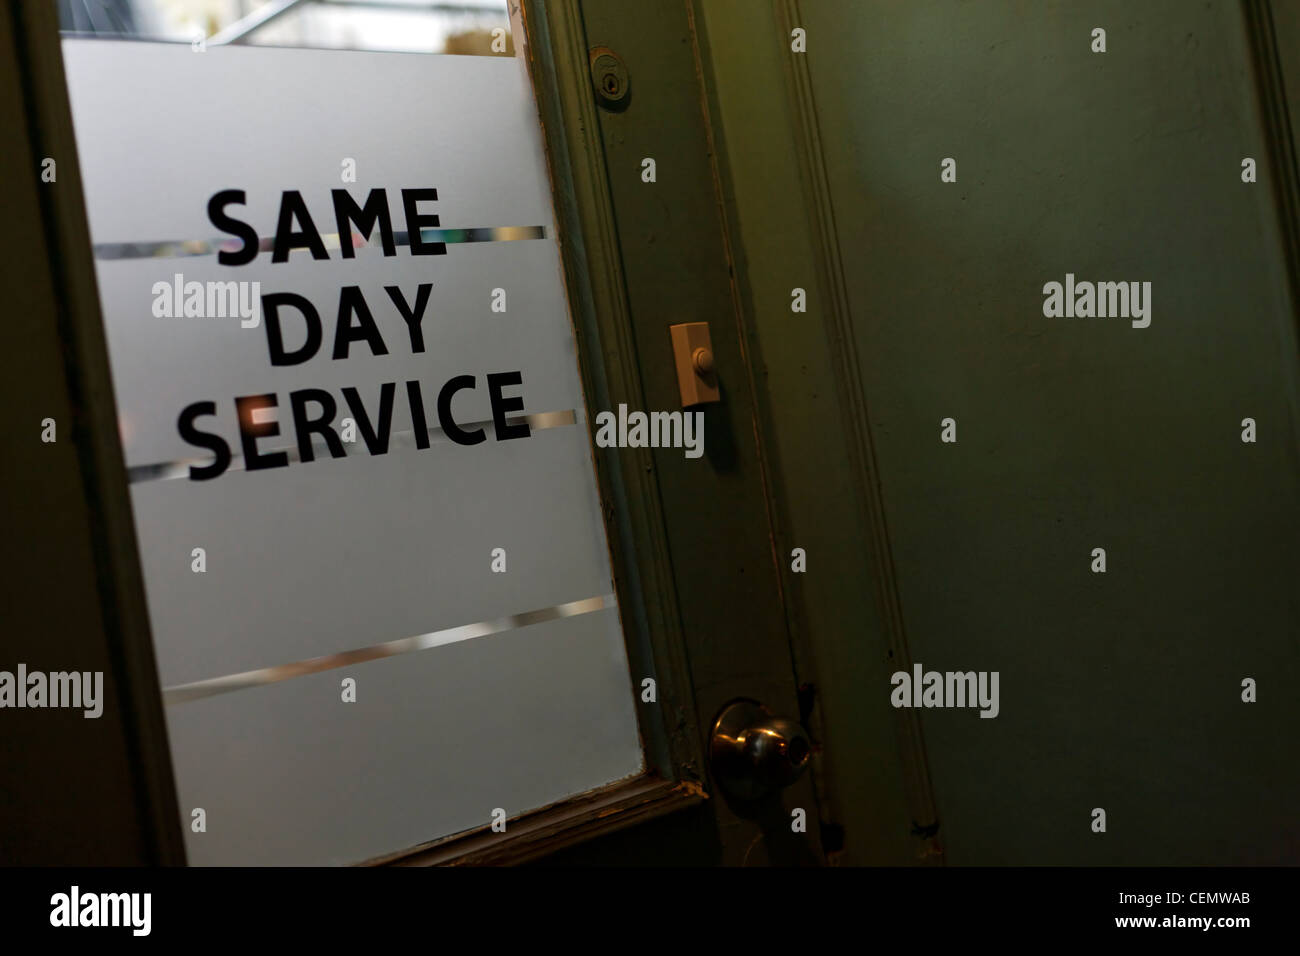 Same Day Service - Stock Image